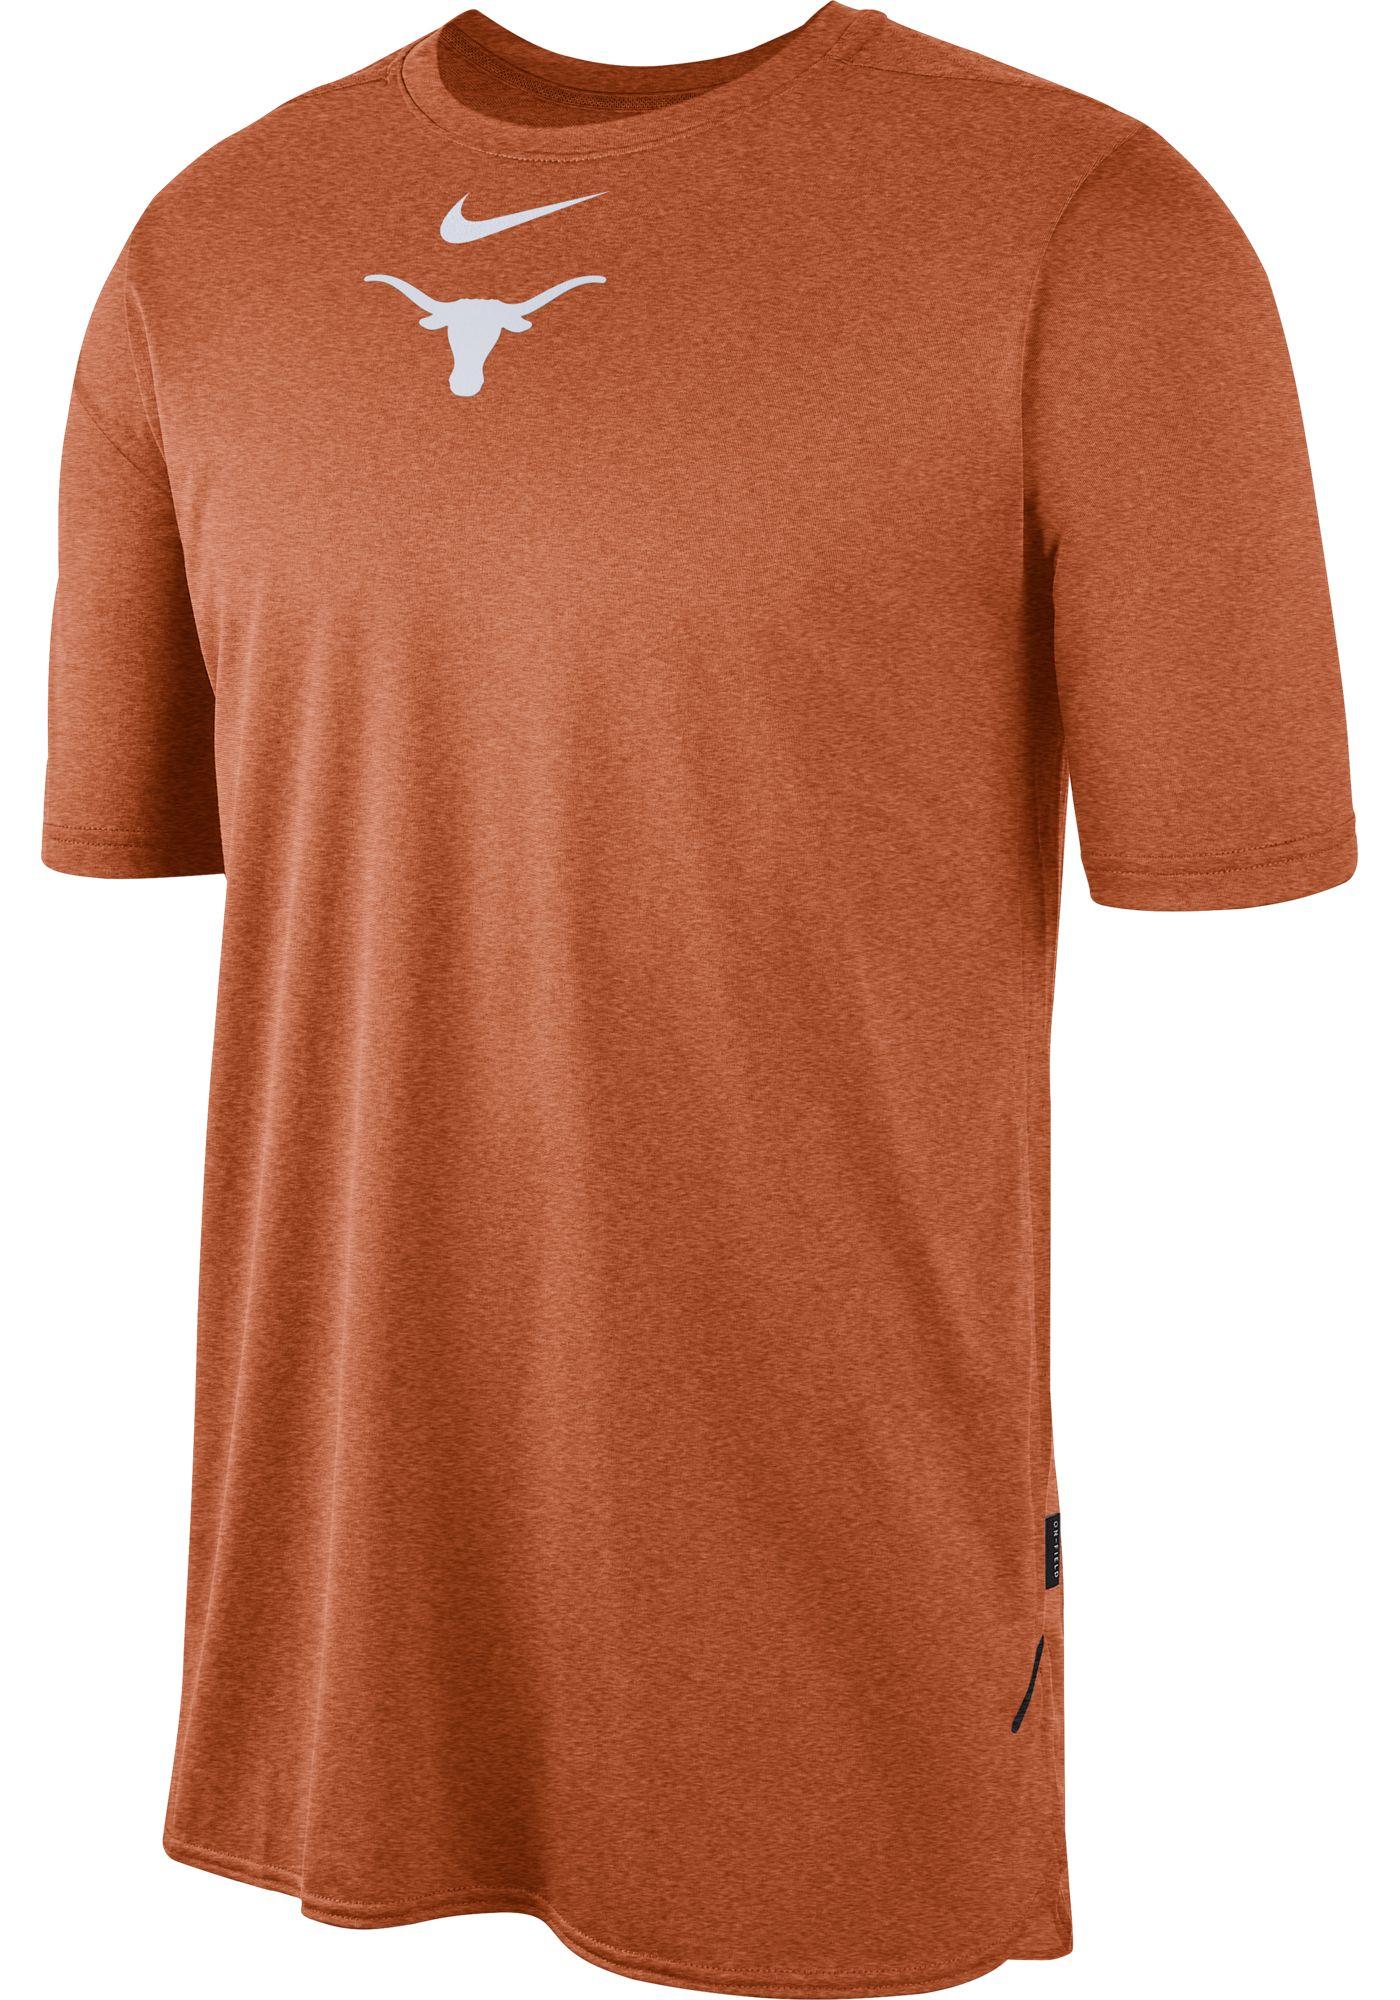 Nike Men's Texas Longhorns Burnt Orange Player Dri-FIT TechKnit T-Shirt